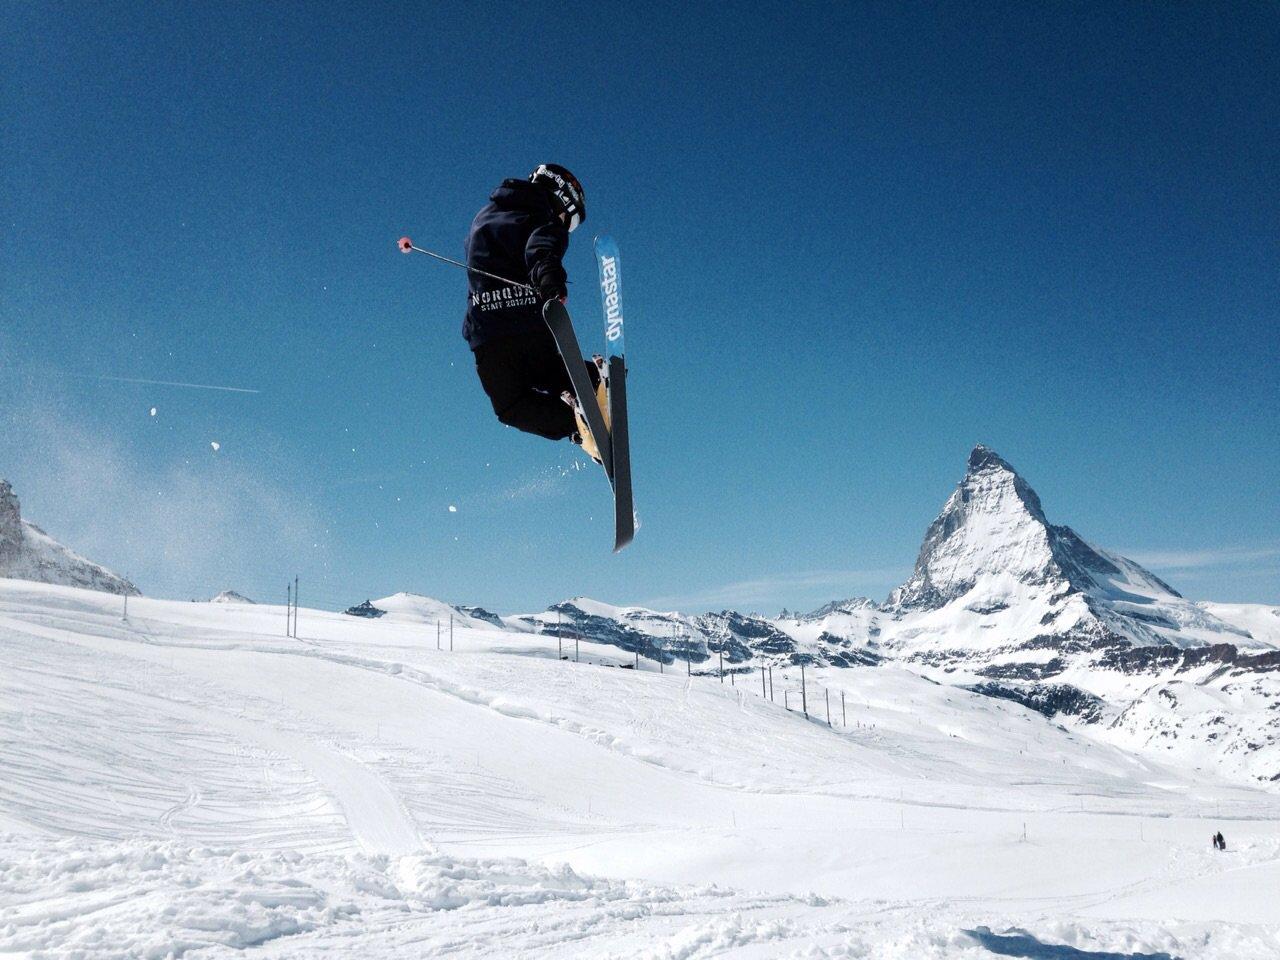 Messin with the Matterhorn